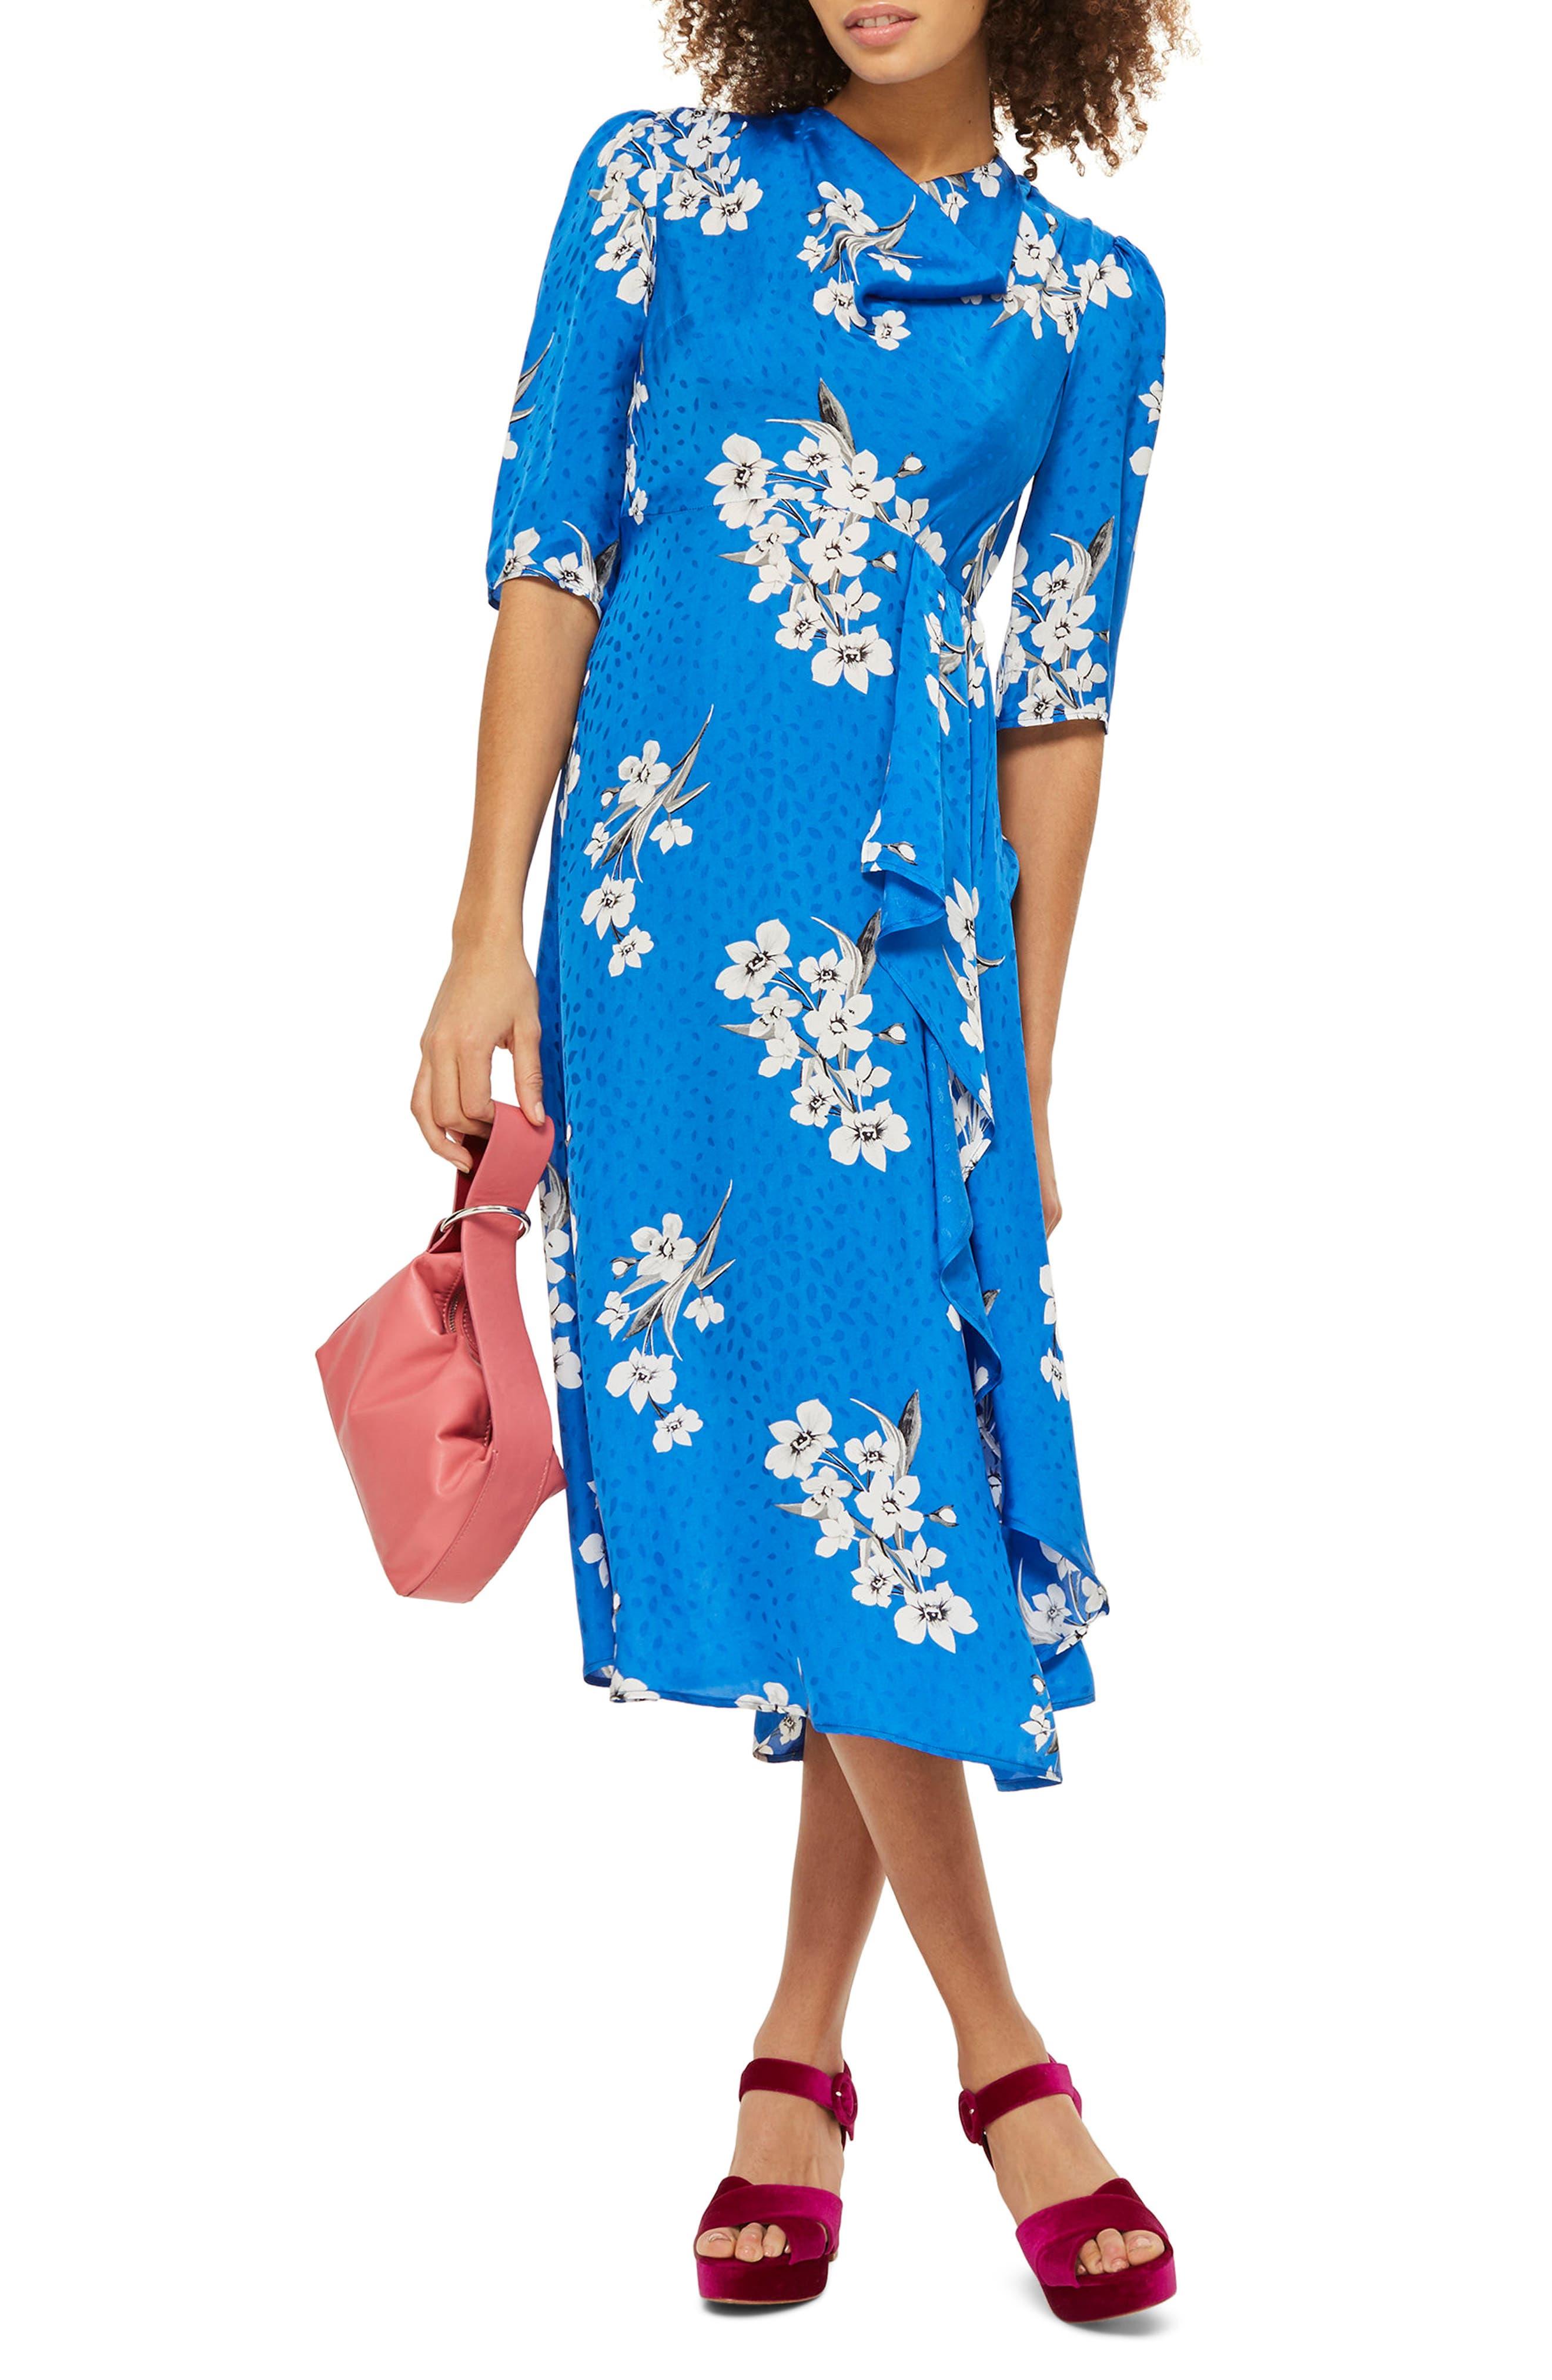 Topshop Floral Print Midi Dress